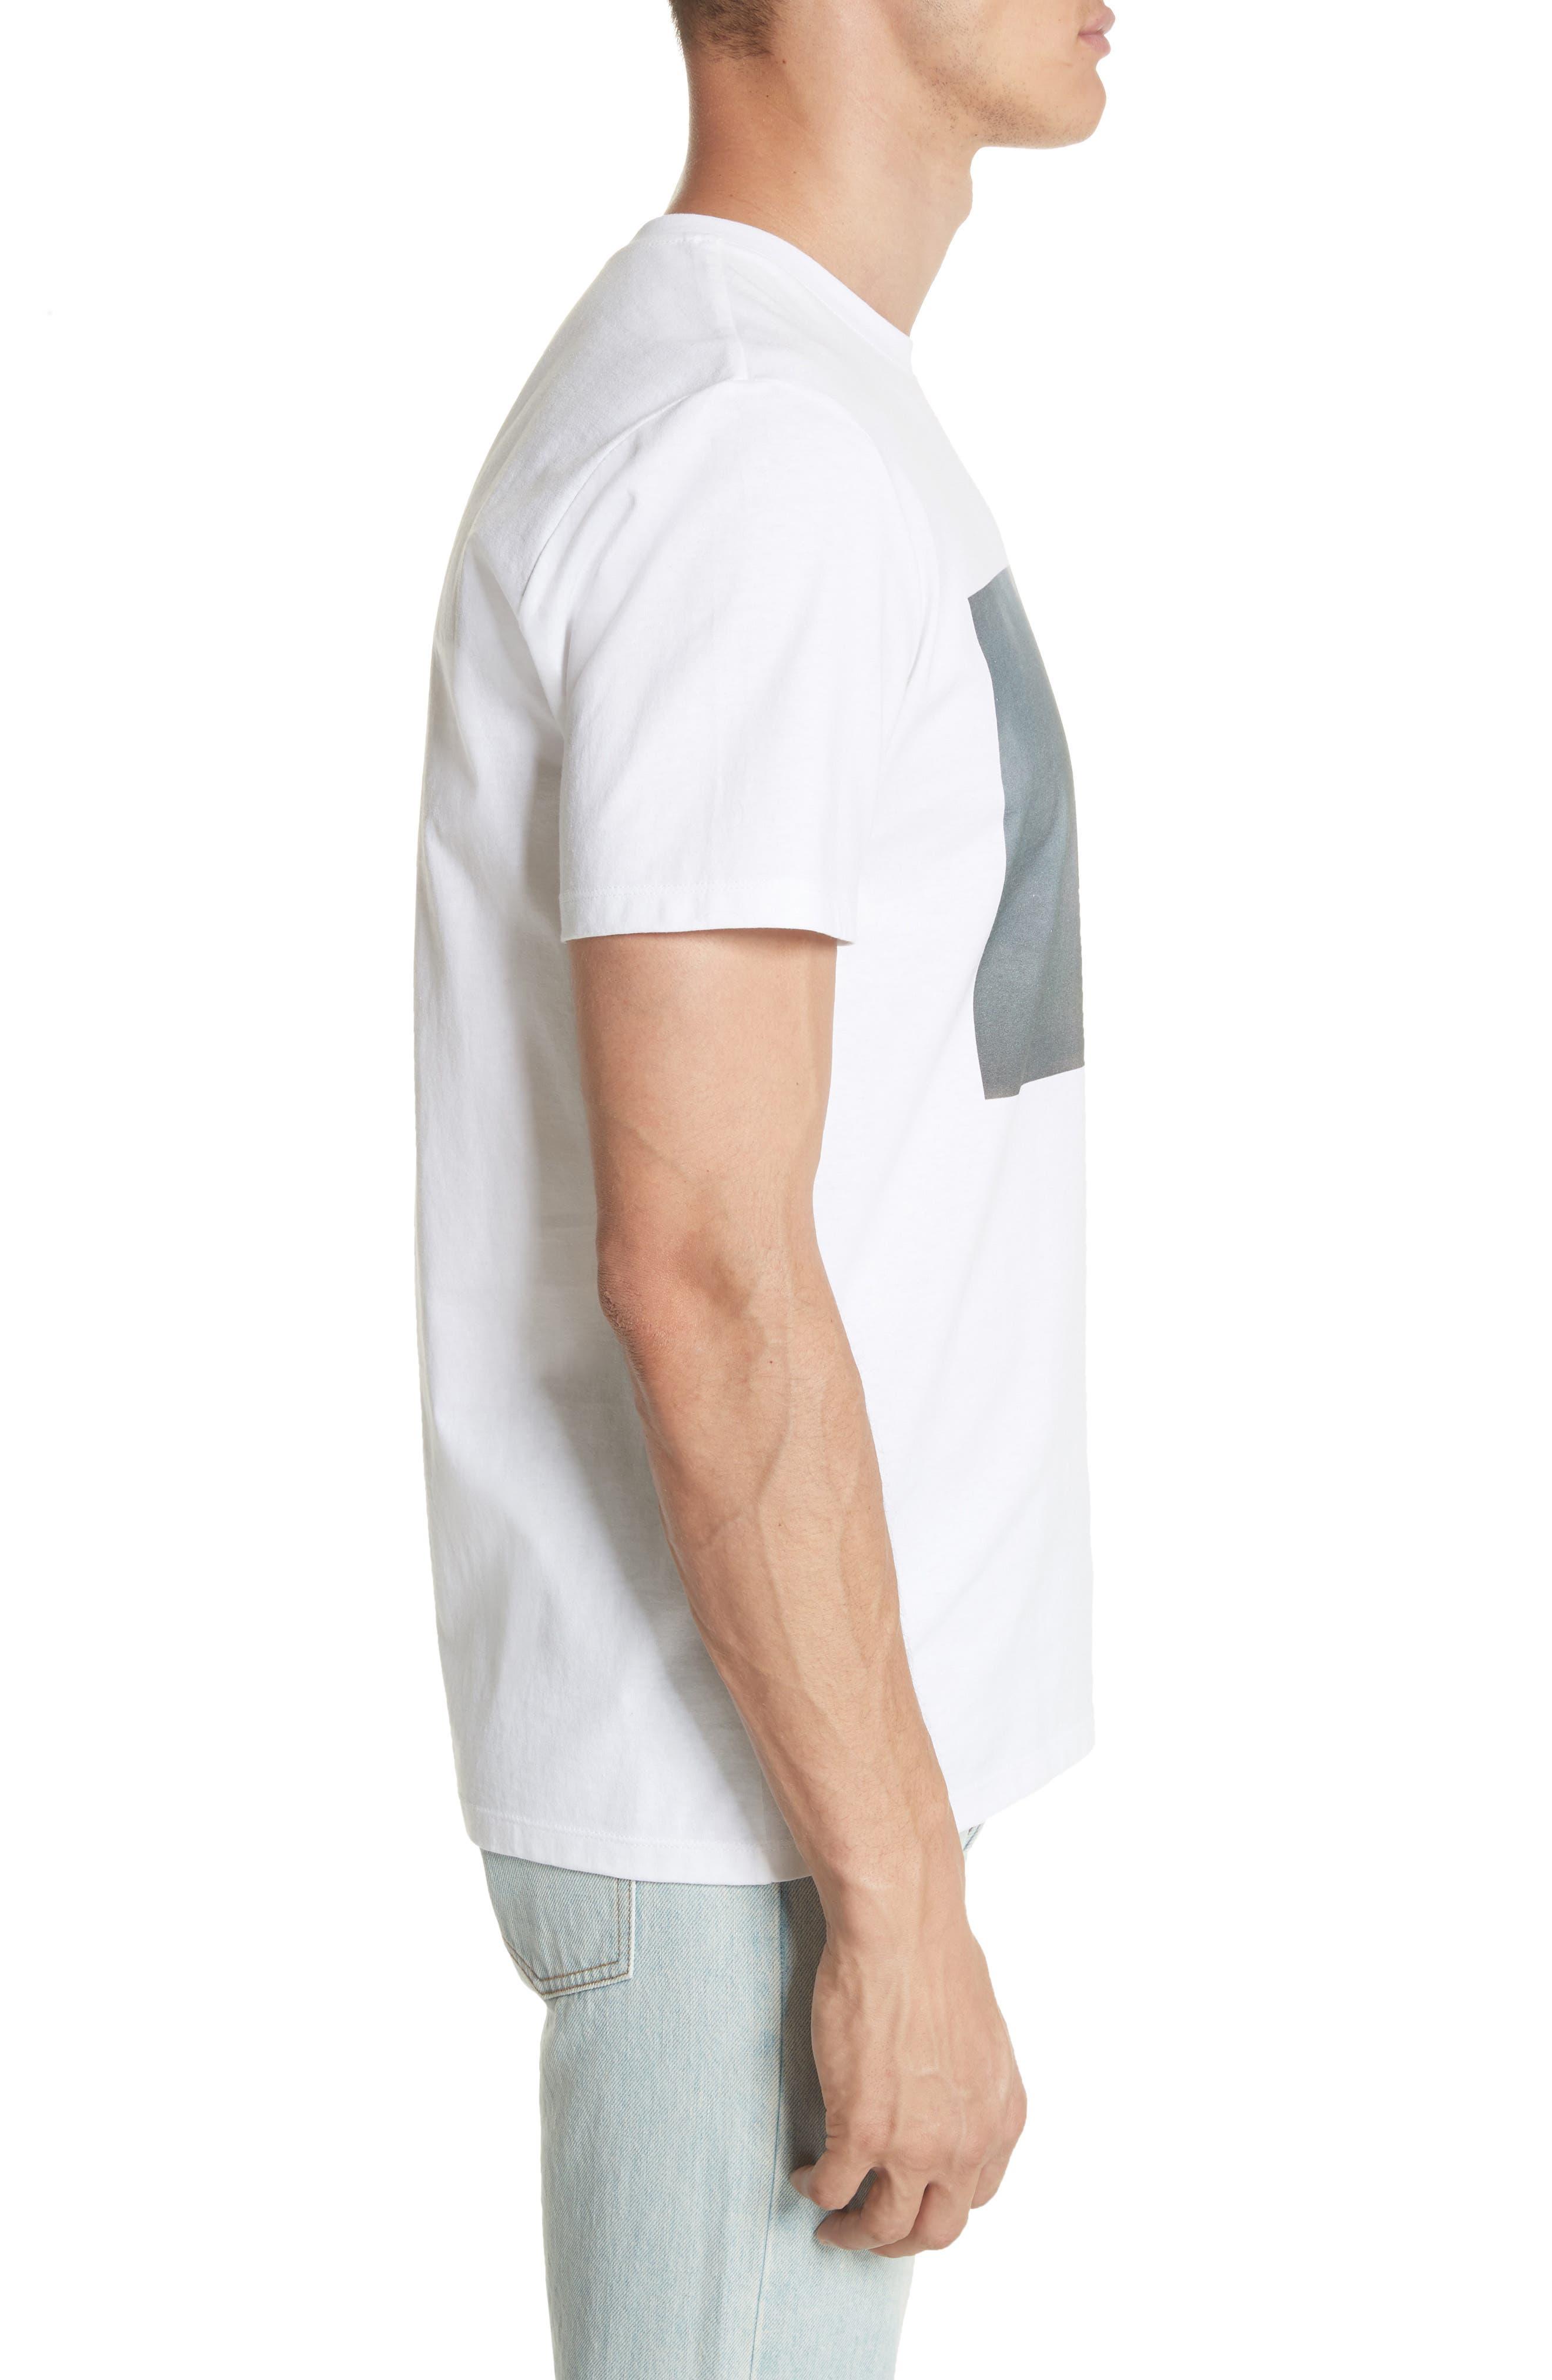 Tropicool Graphic T-Shirt,                             Alternate thumbnail 3, color,                             100